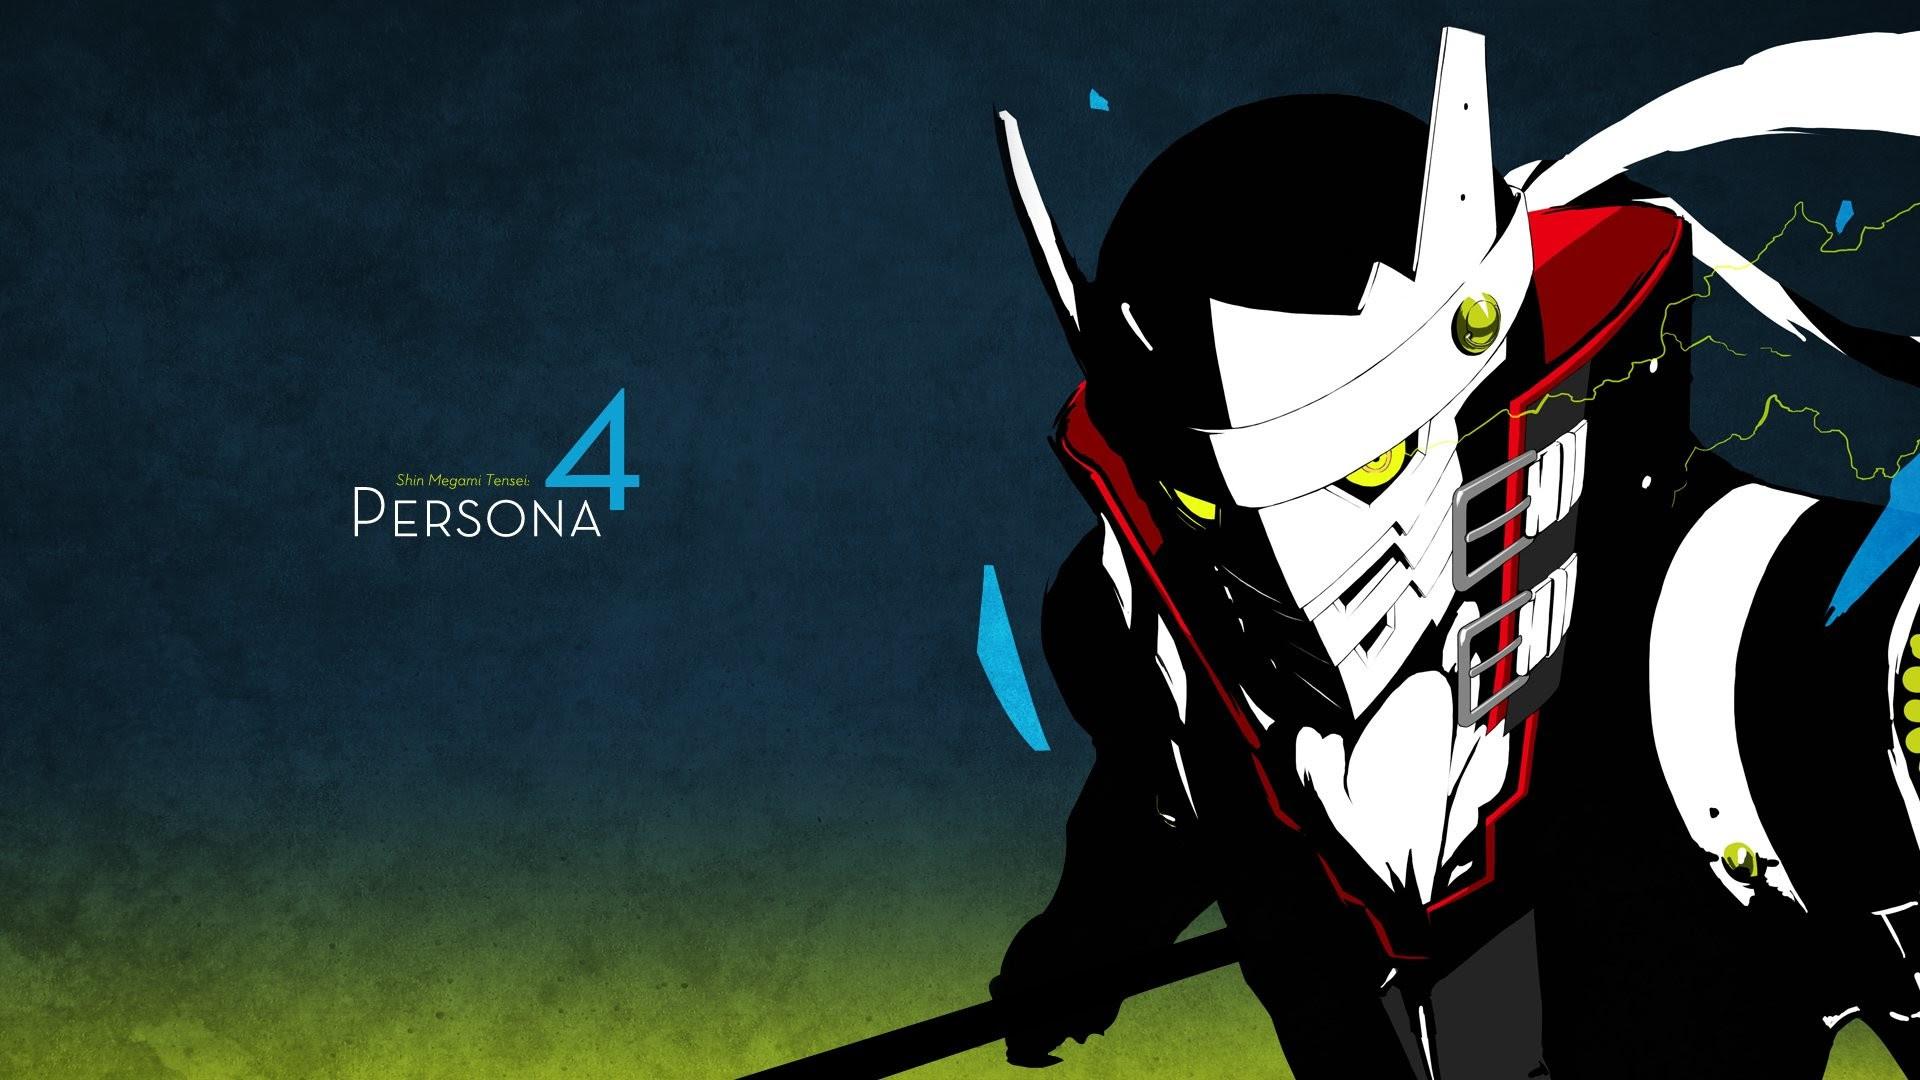 Persona 4 Hd Wallpaper 72 Images